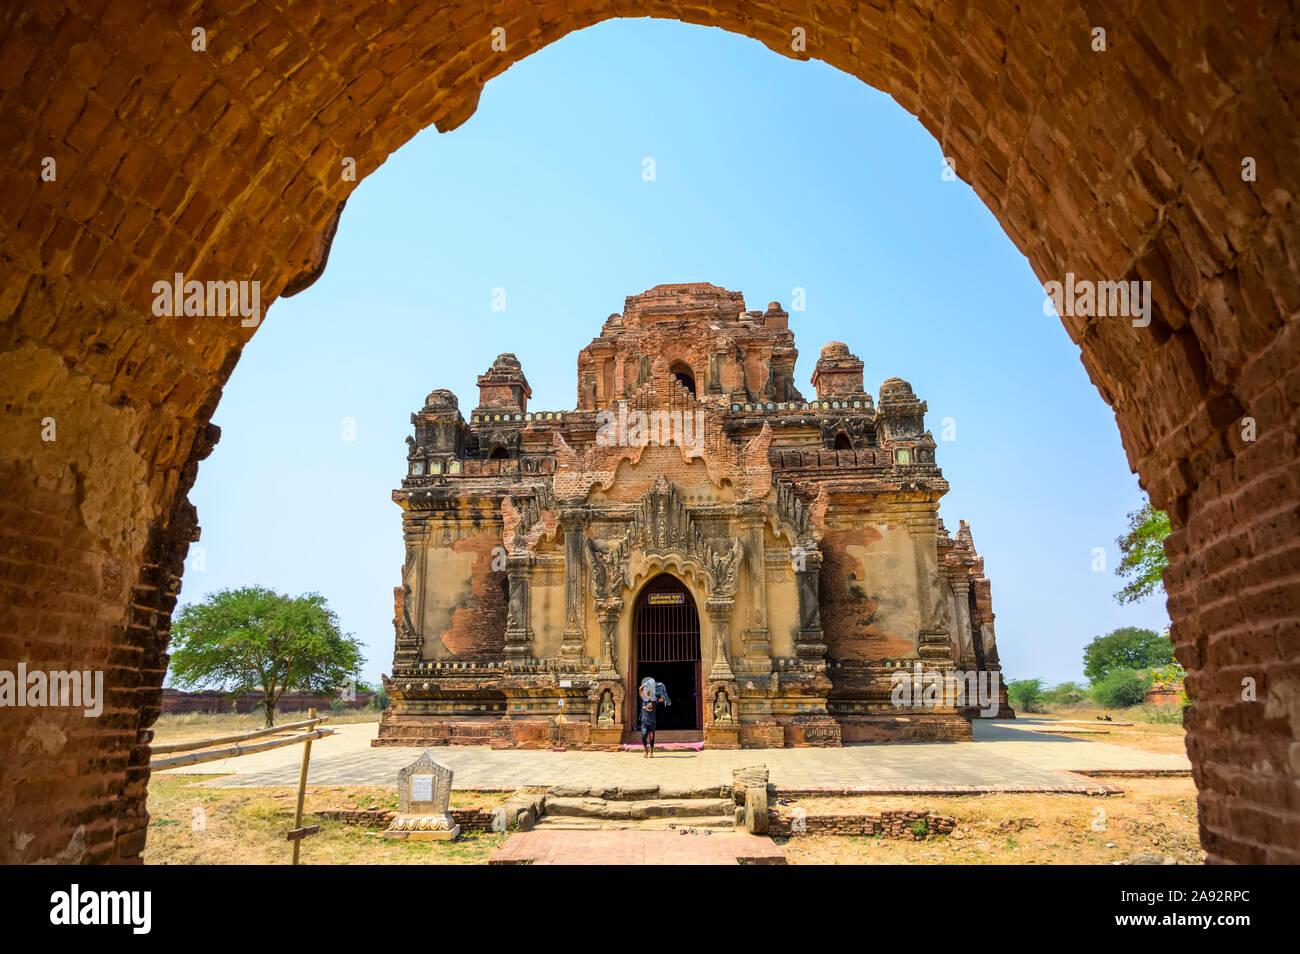 Templo budista; Bagan, Mandalay Región, Myanmar Foto de stock